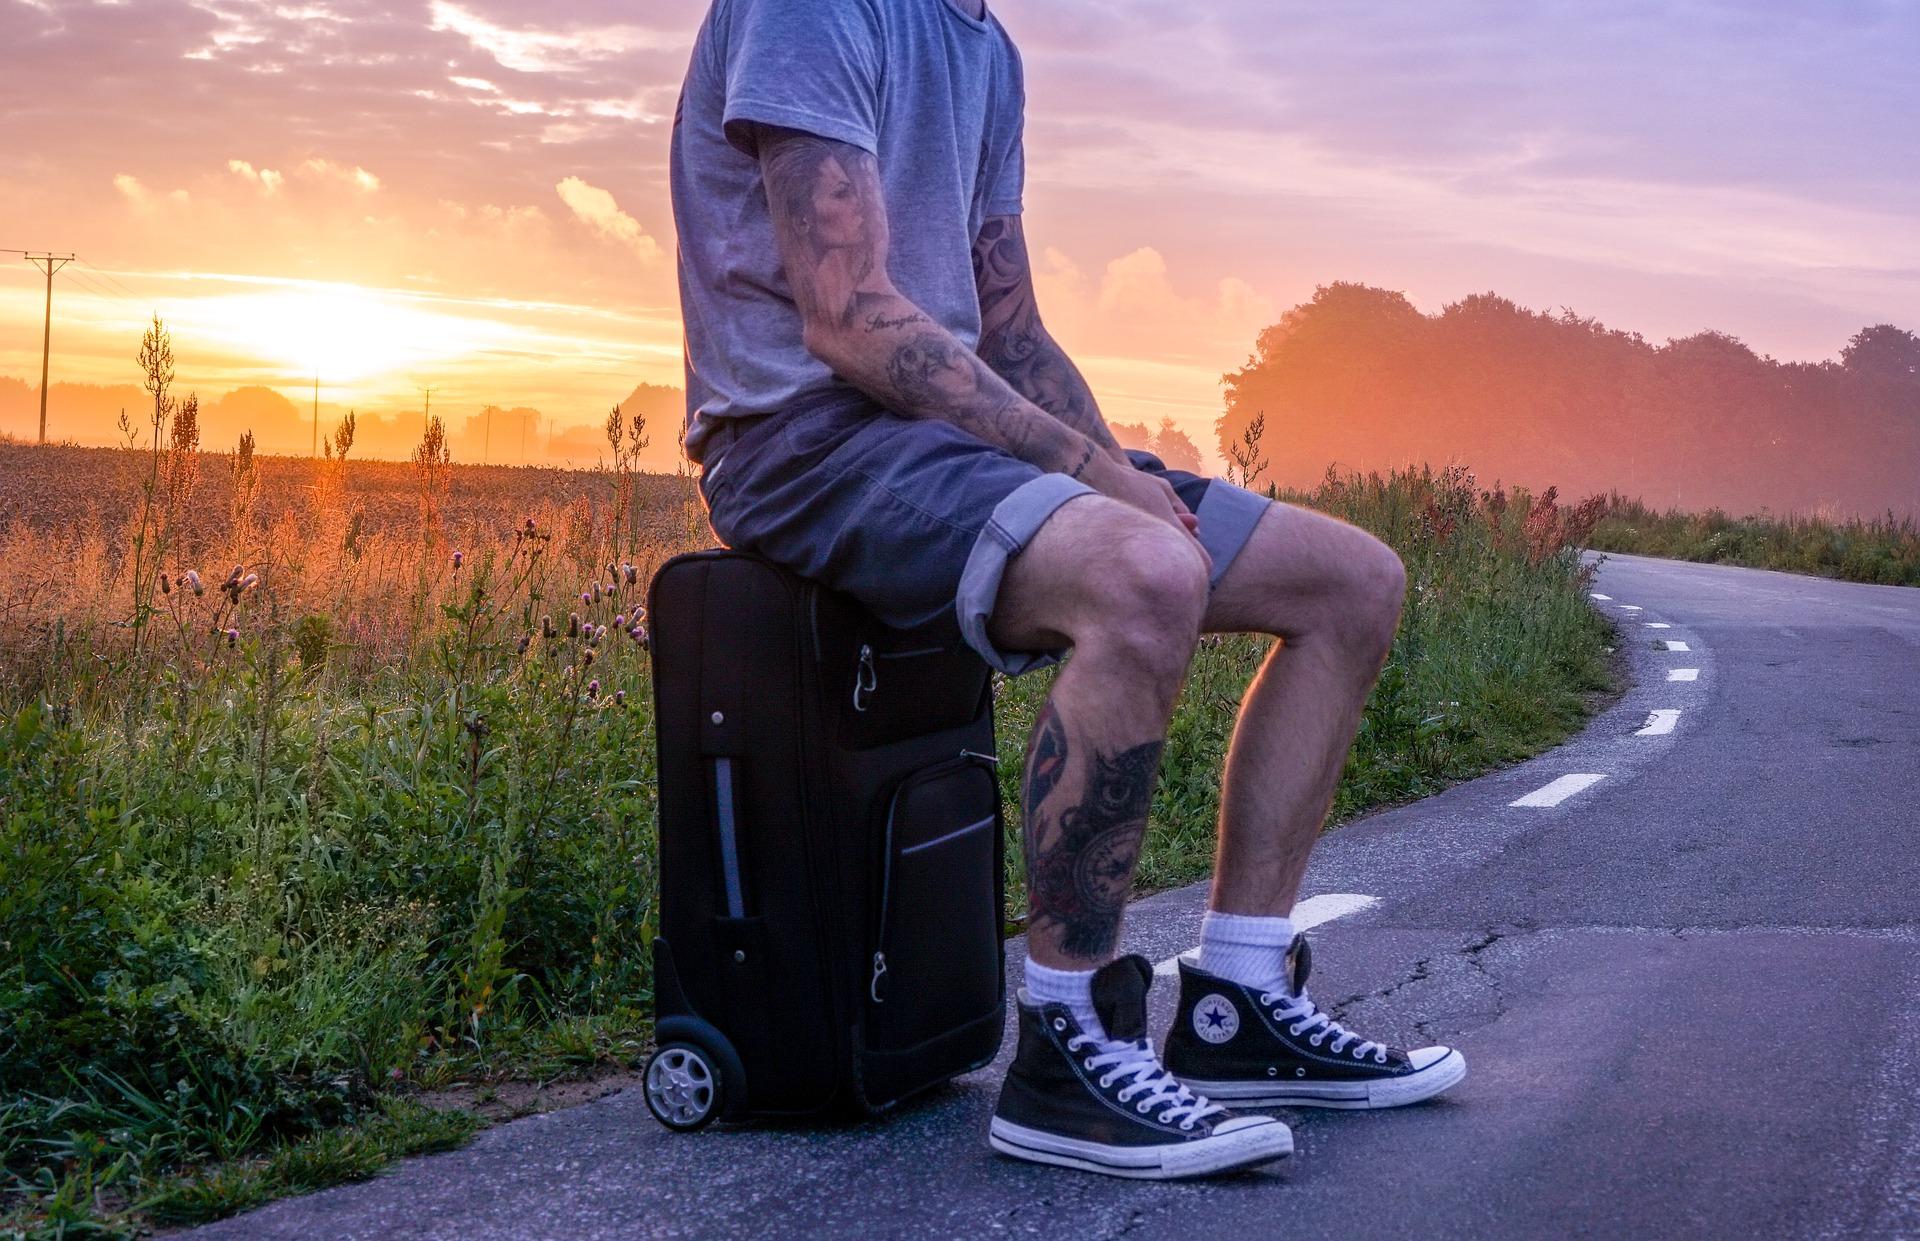 Farre studerar utomlands